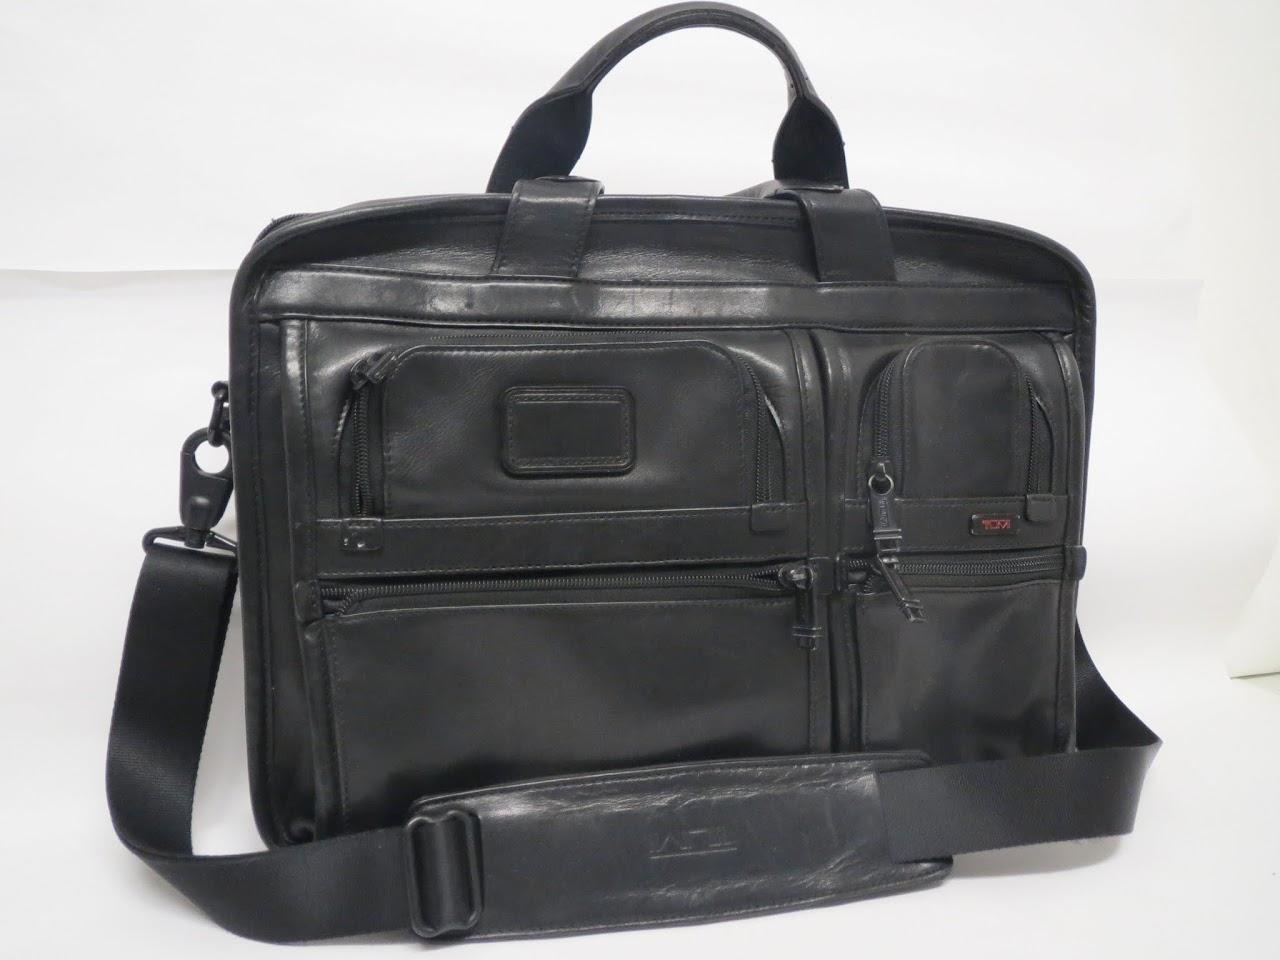 Tumi Laptop Case